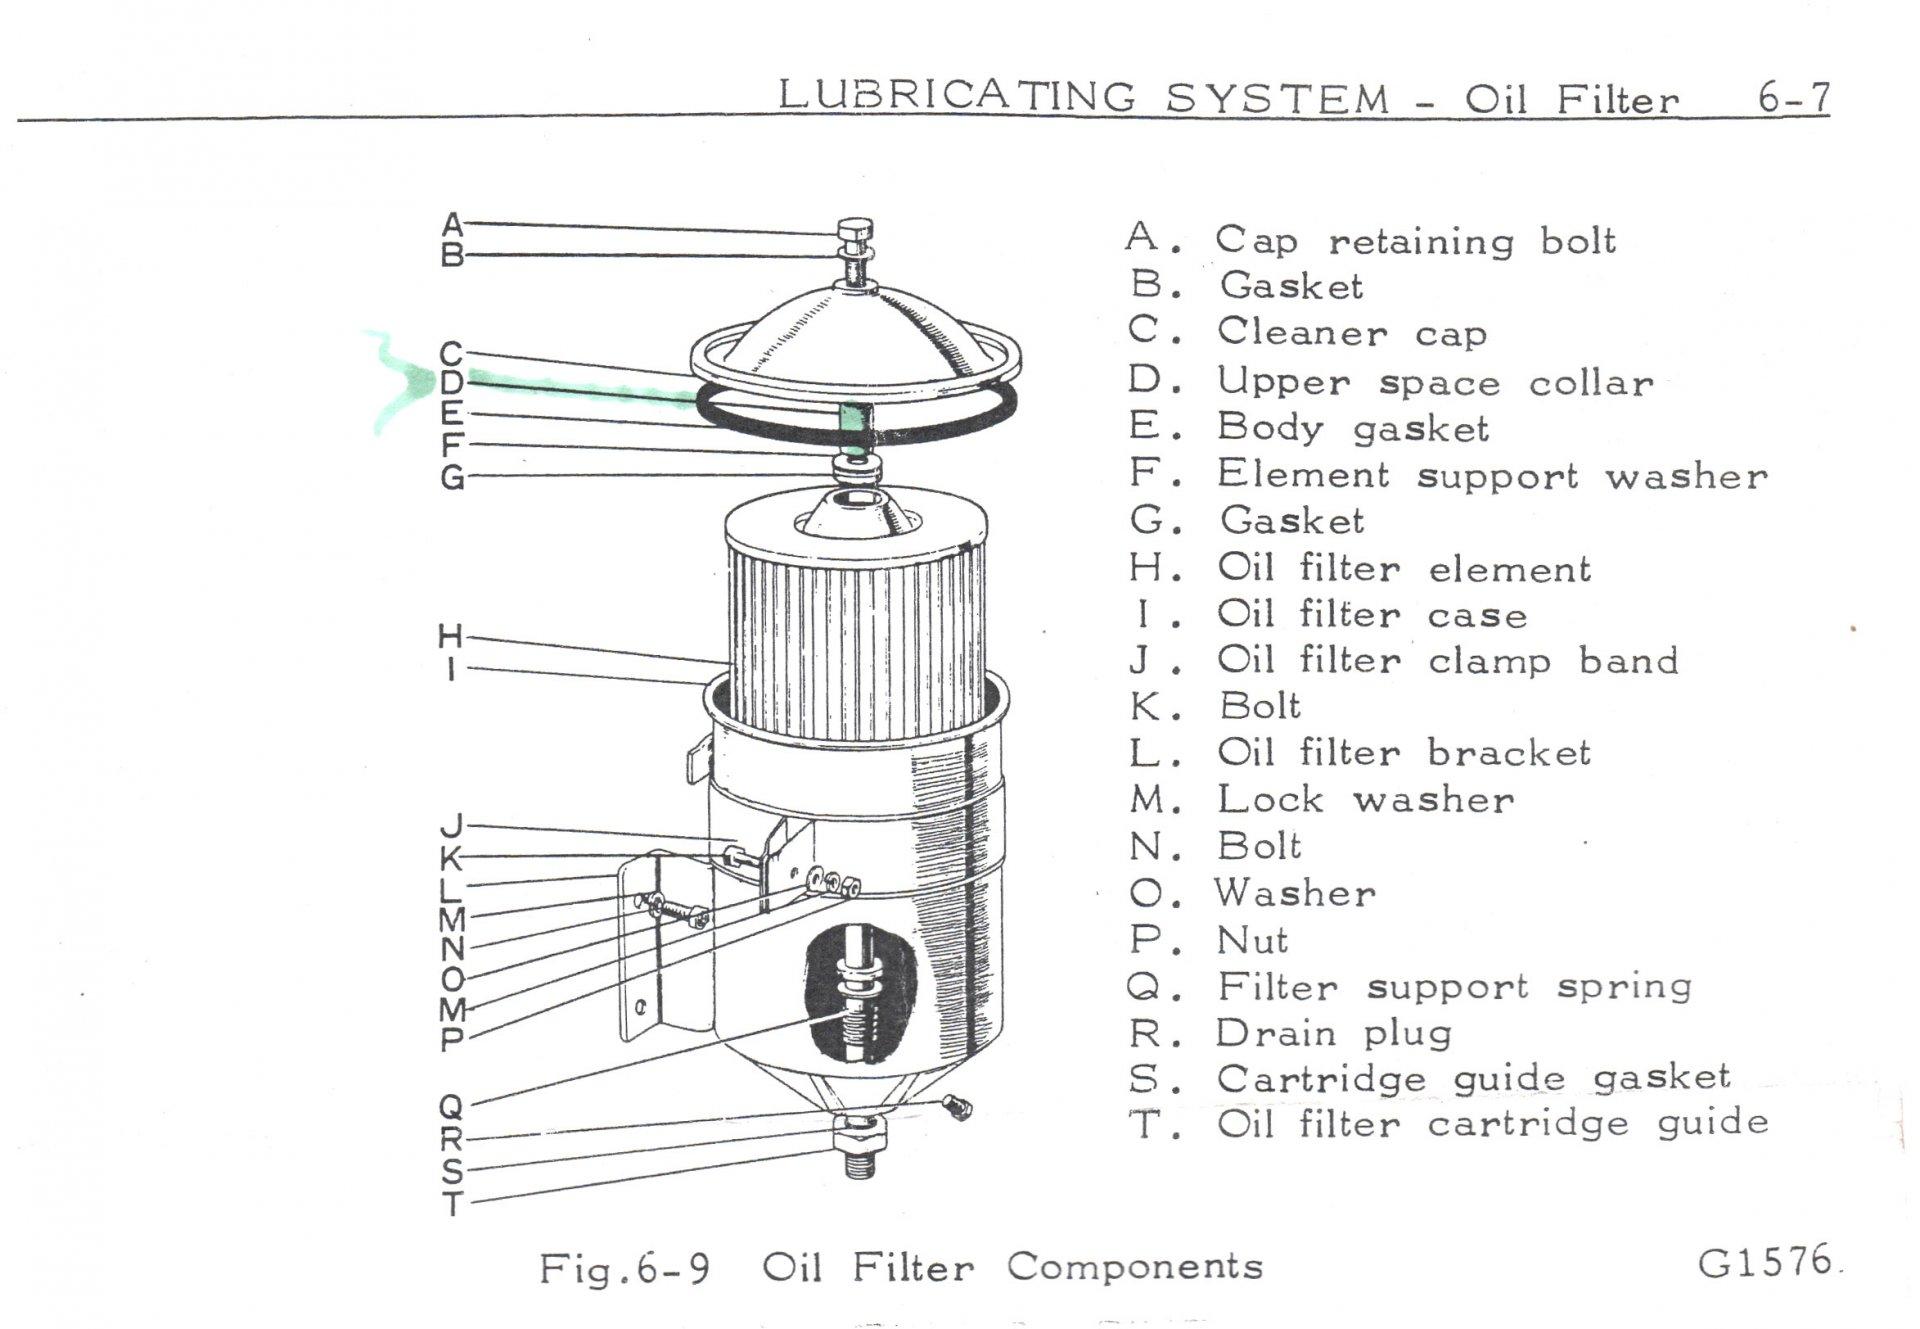 oilfilter.jpeg